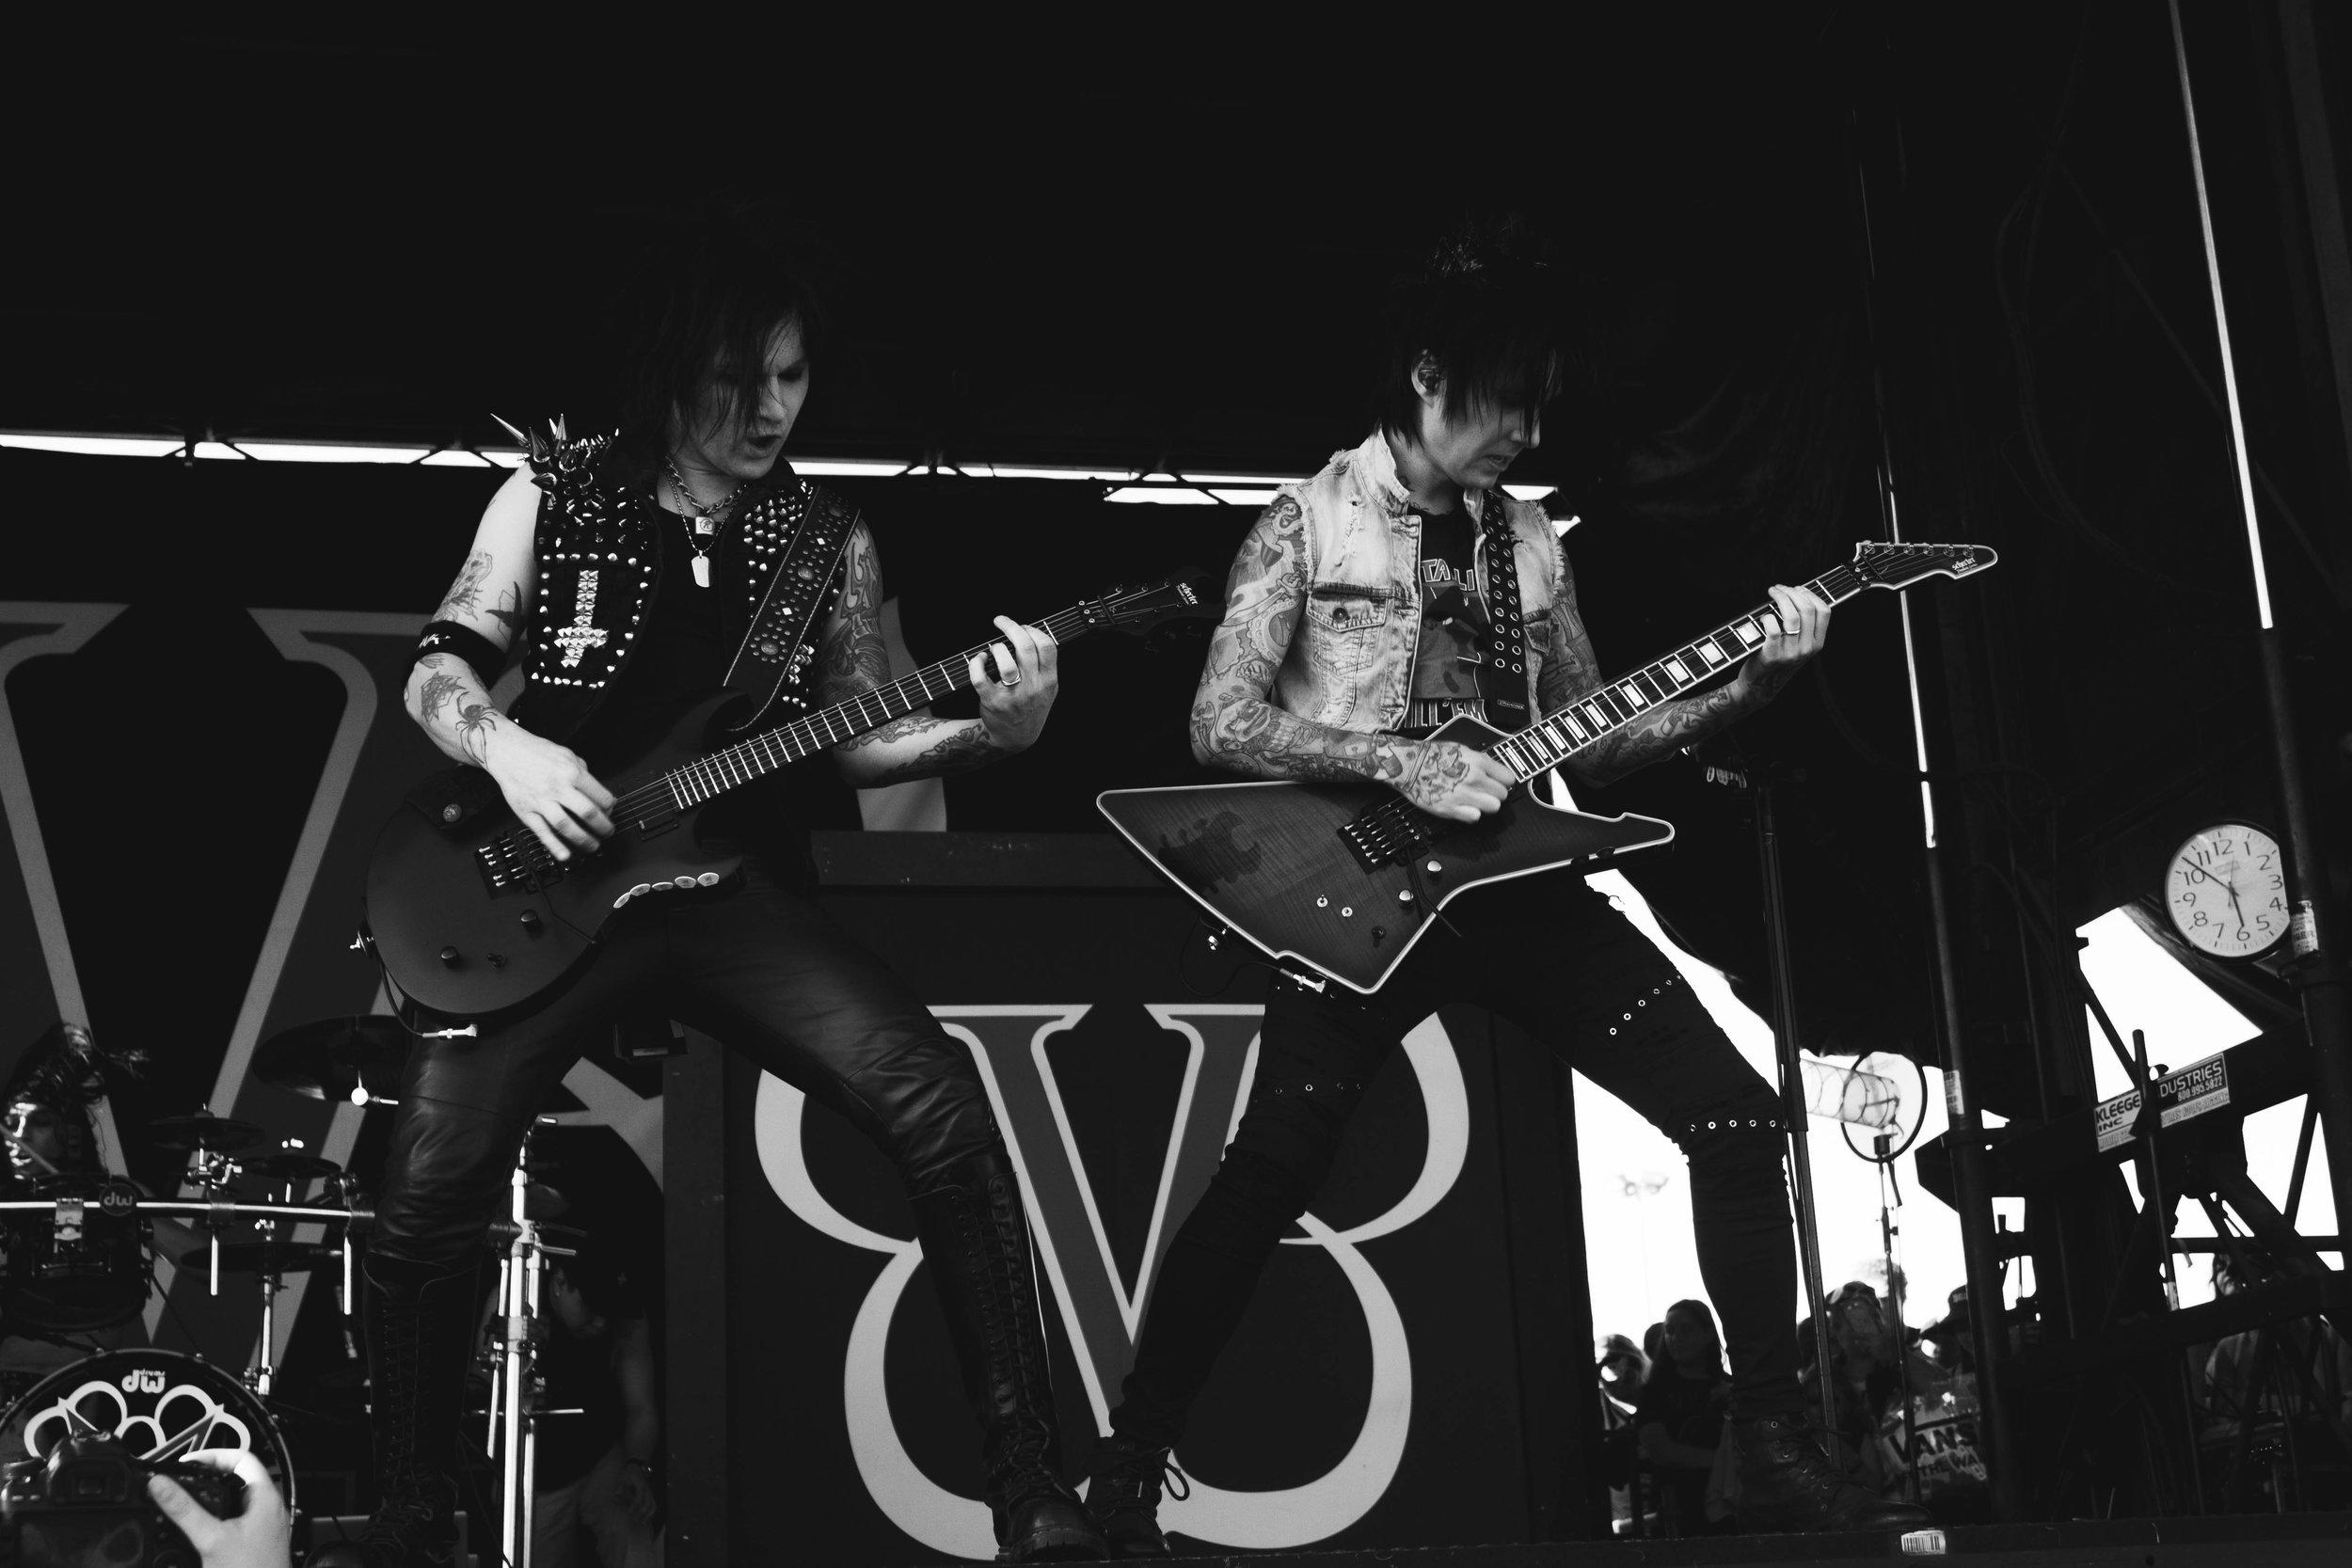 Black Veil Brides_VANS WARPED TOUR_EDG-8.jpg